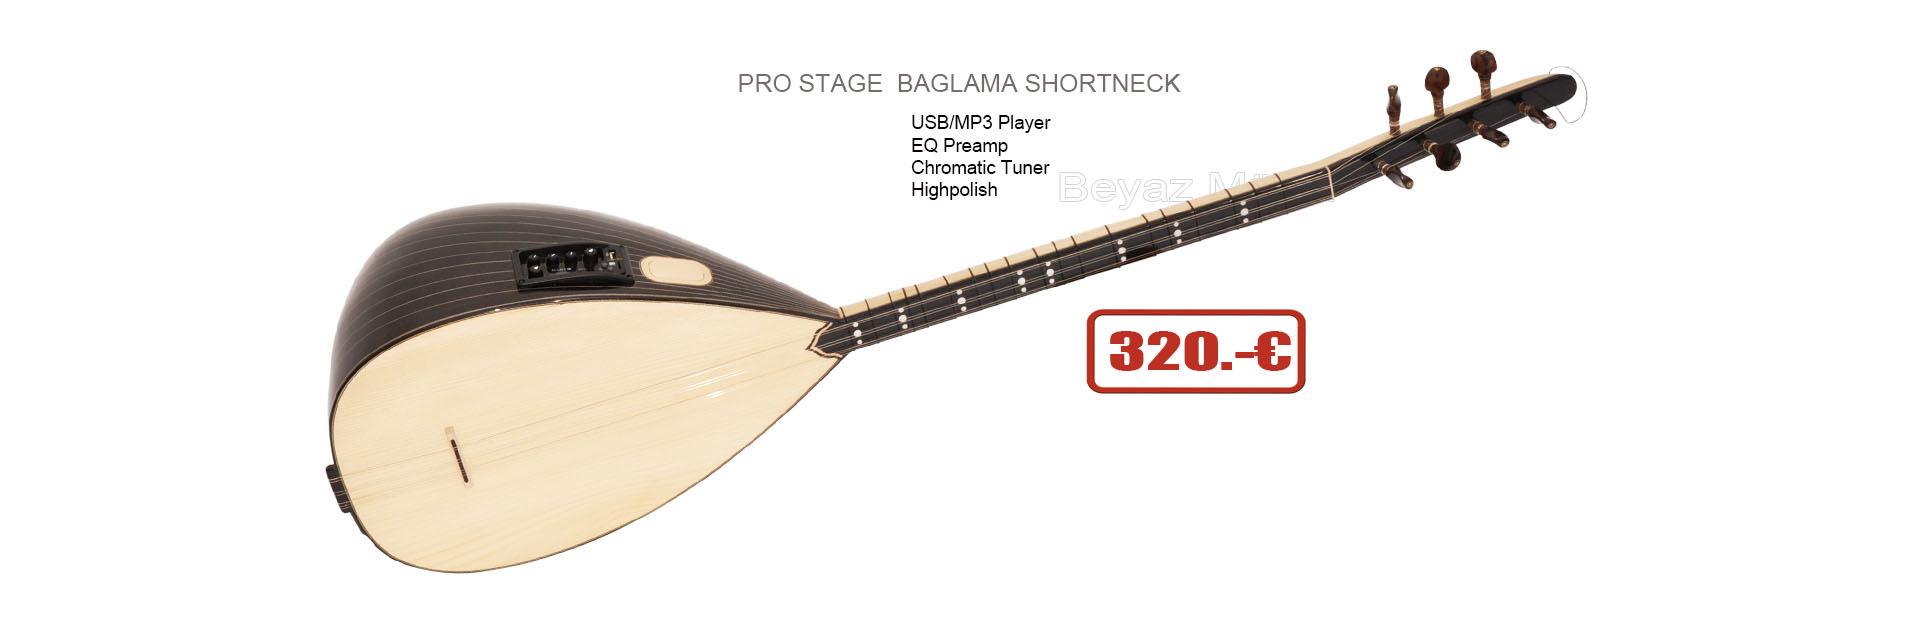 New Serie Pro  Shortneck Baglama